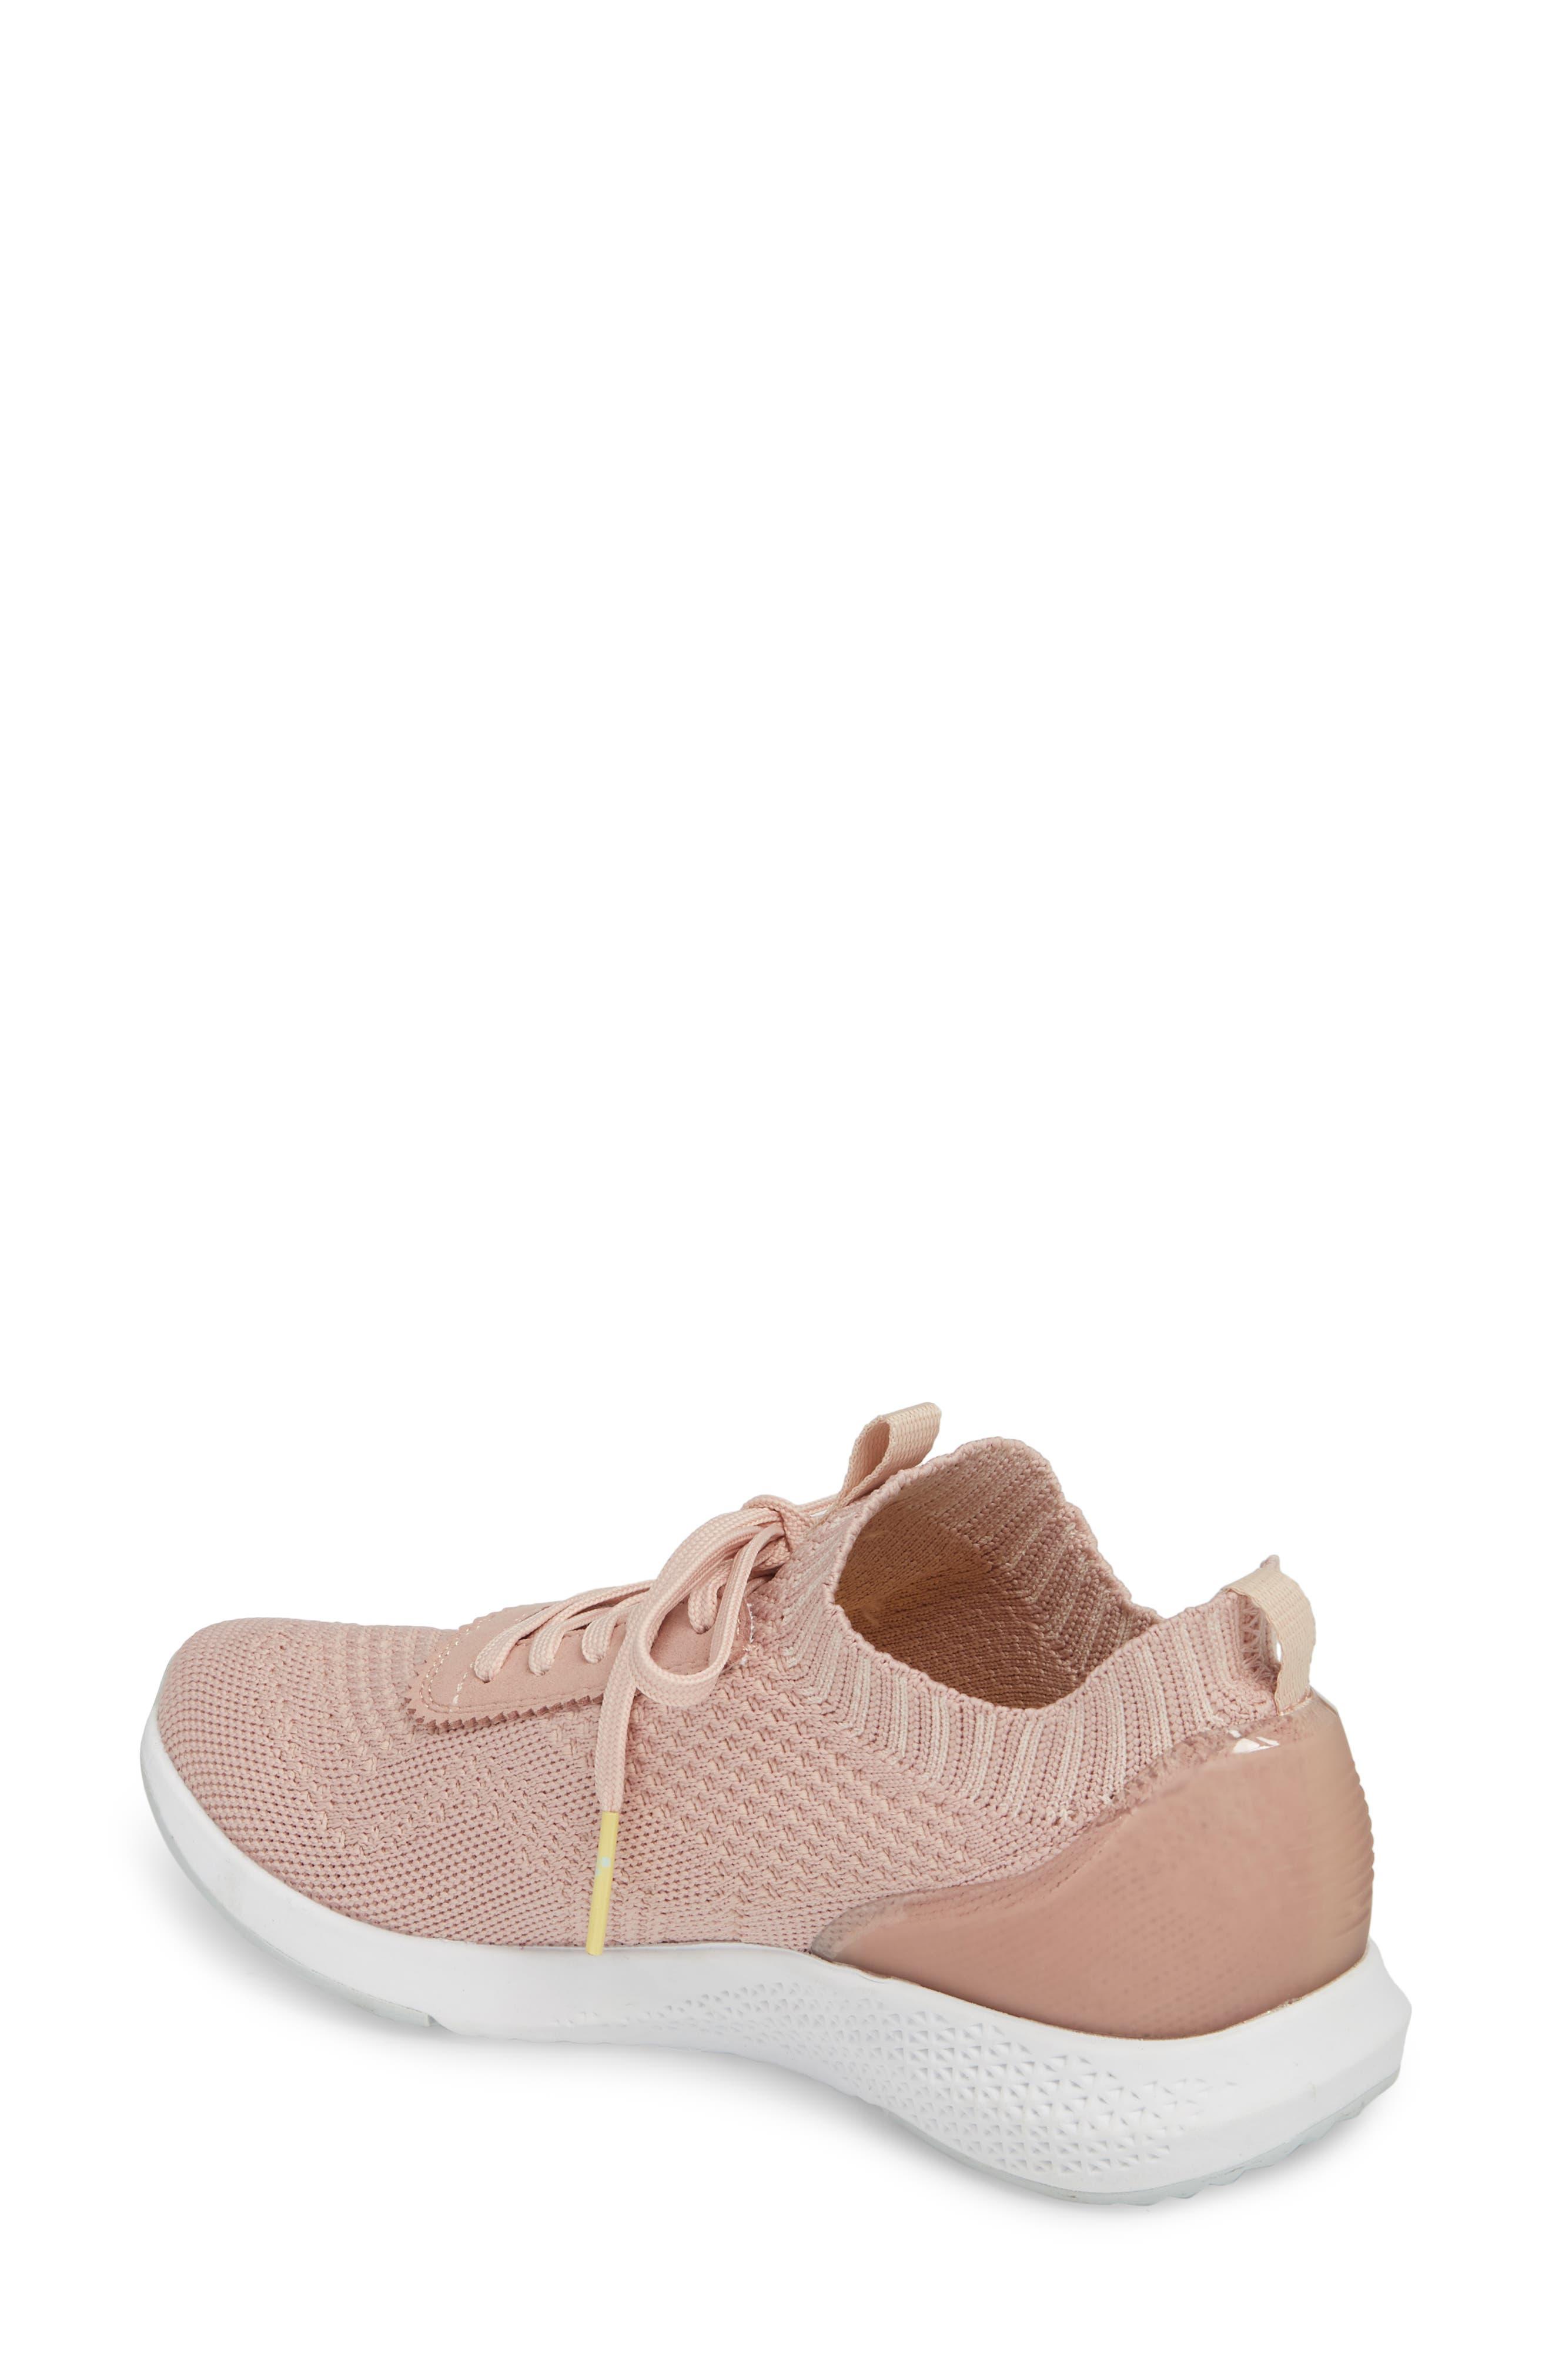 Tavia Sneaker,                             Alternate thumbnail 4, color,